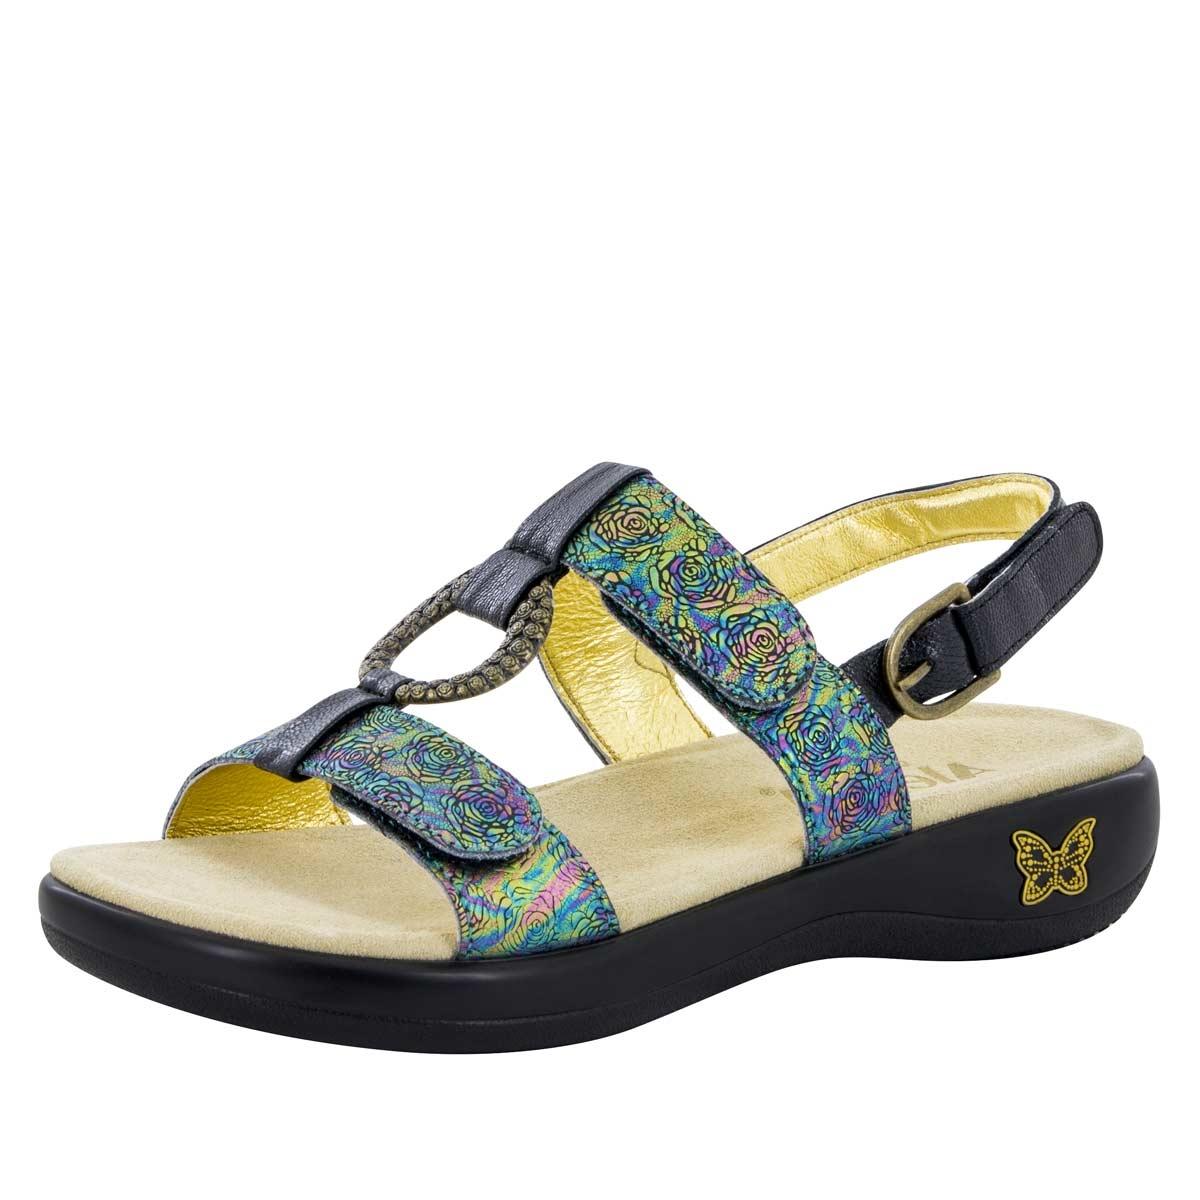 Alegria Shoes Julie Abalone Rose